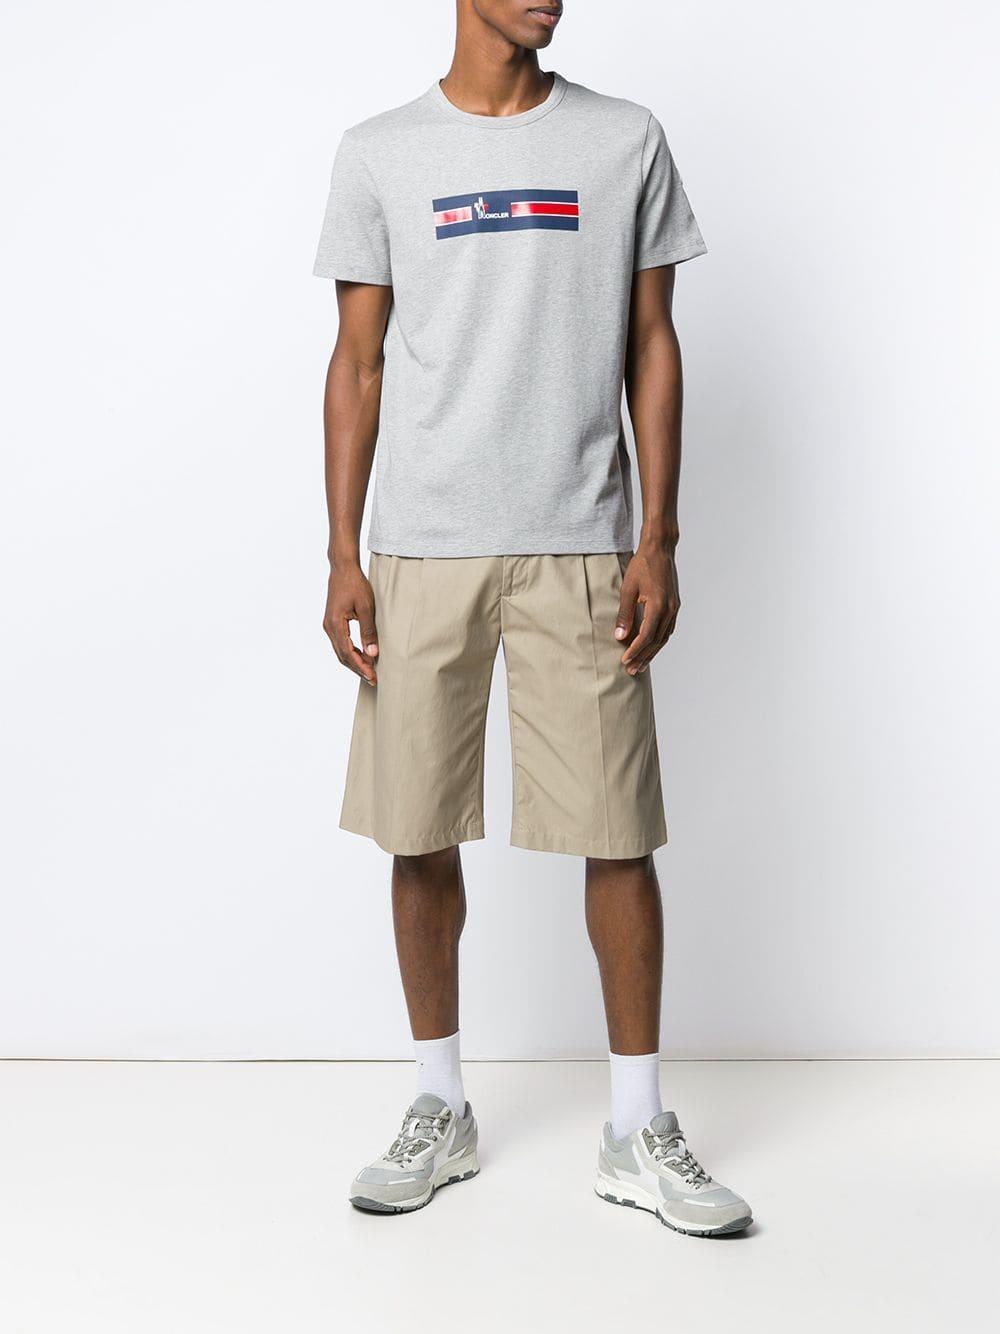 42c189eb30c4 Lyst - Moncler Crew Neck Logo T-shirt in Gray for Men